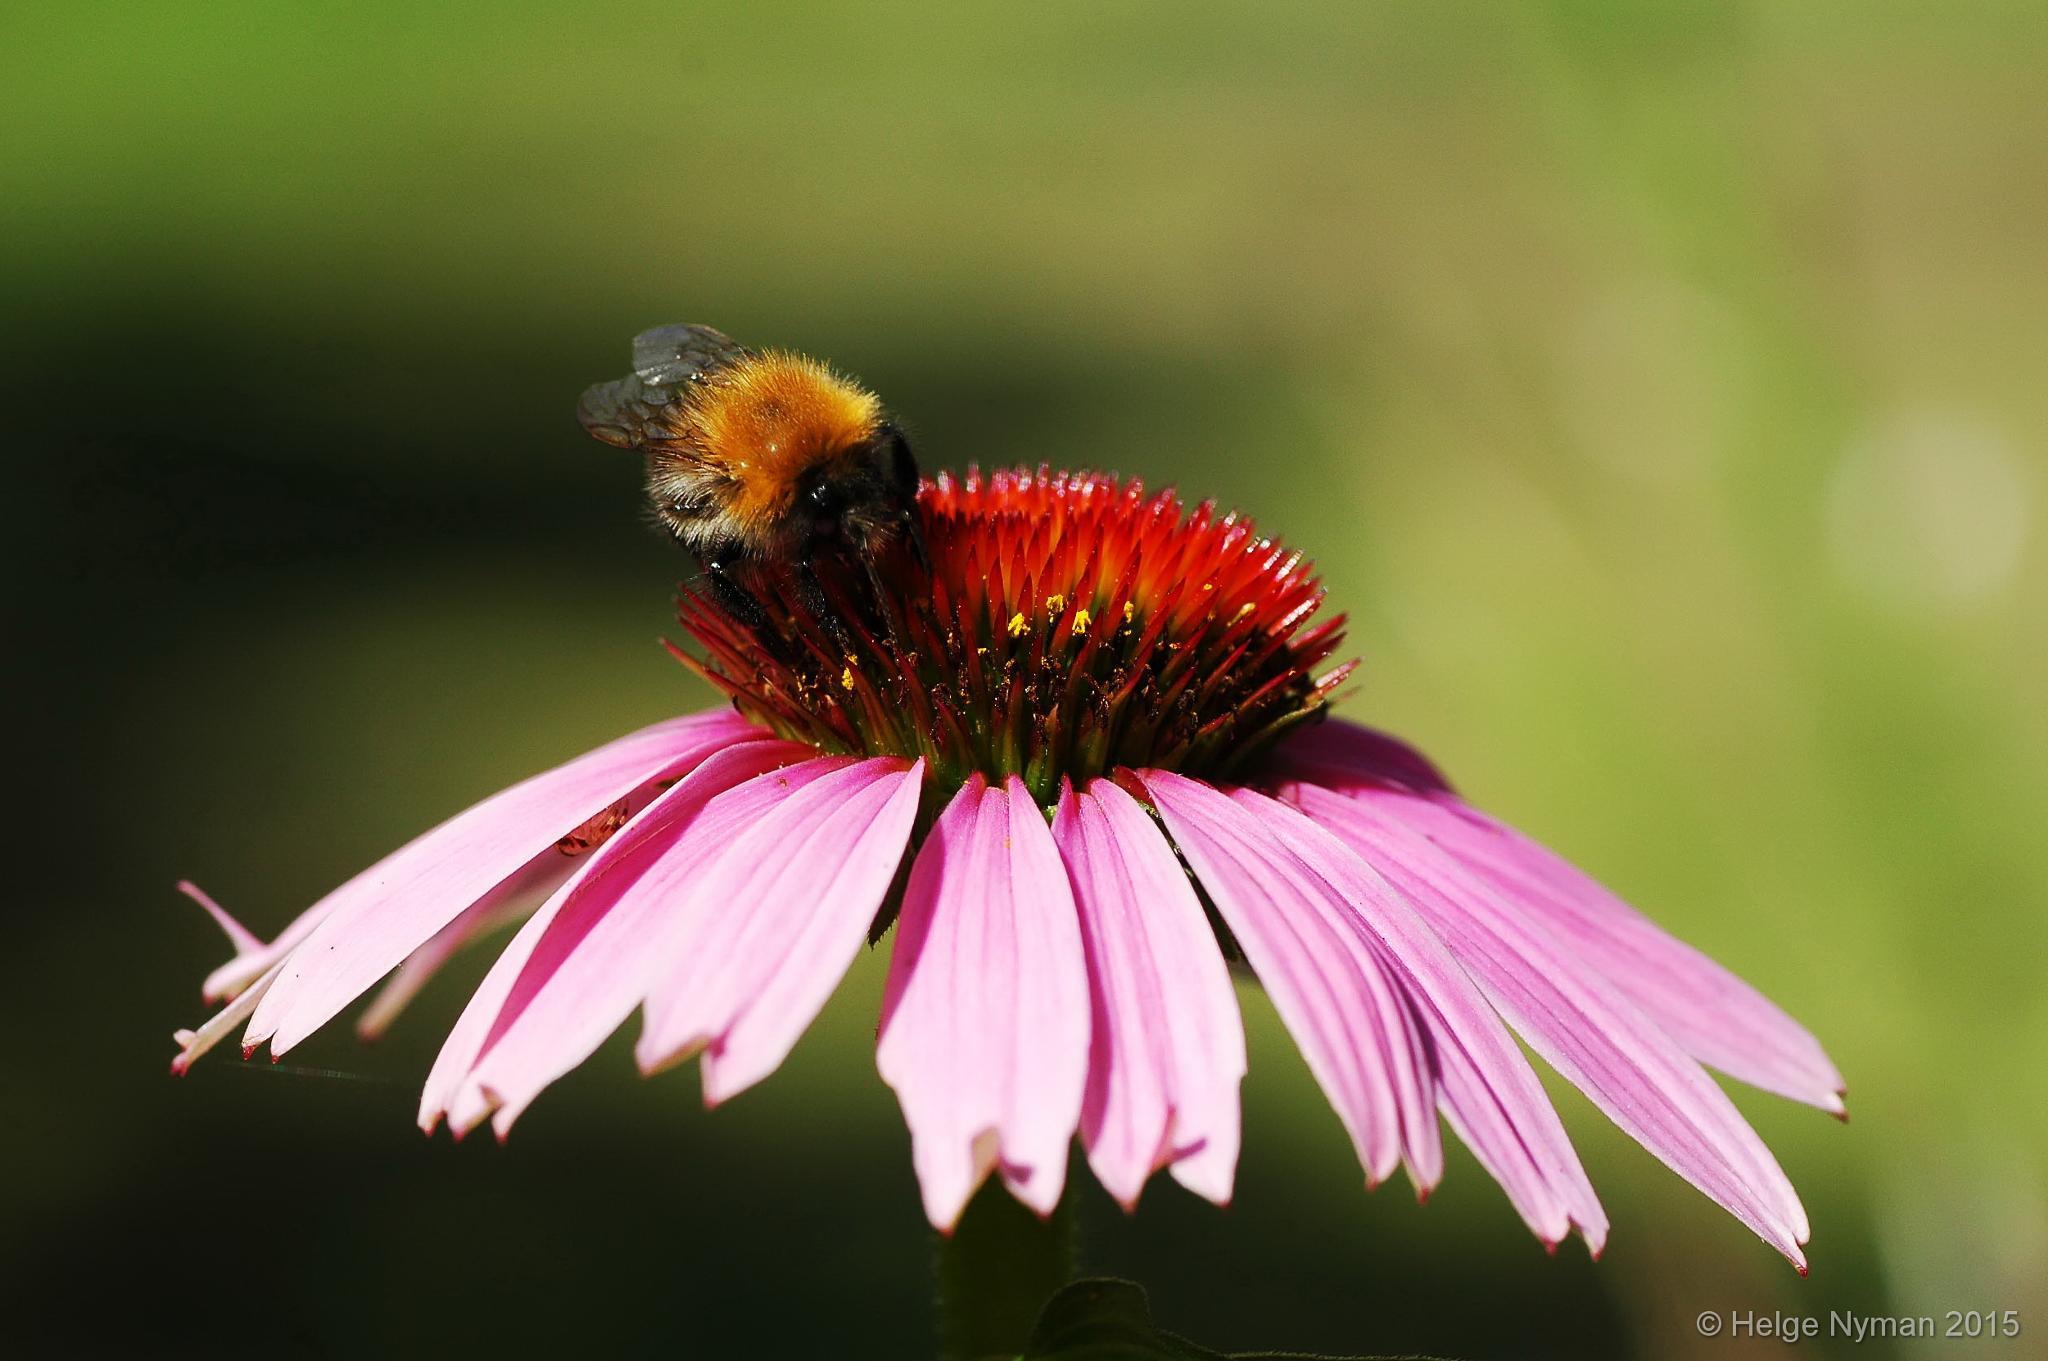 Bumblebee on flower by Helge Nyman